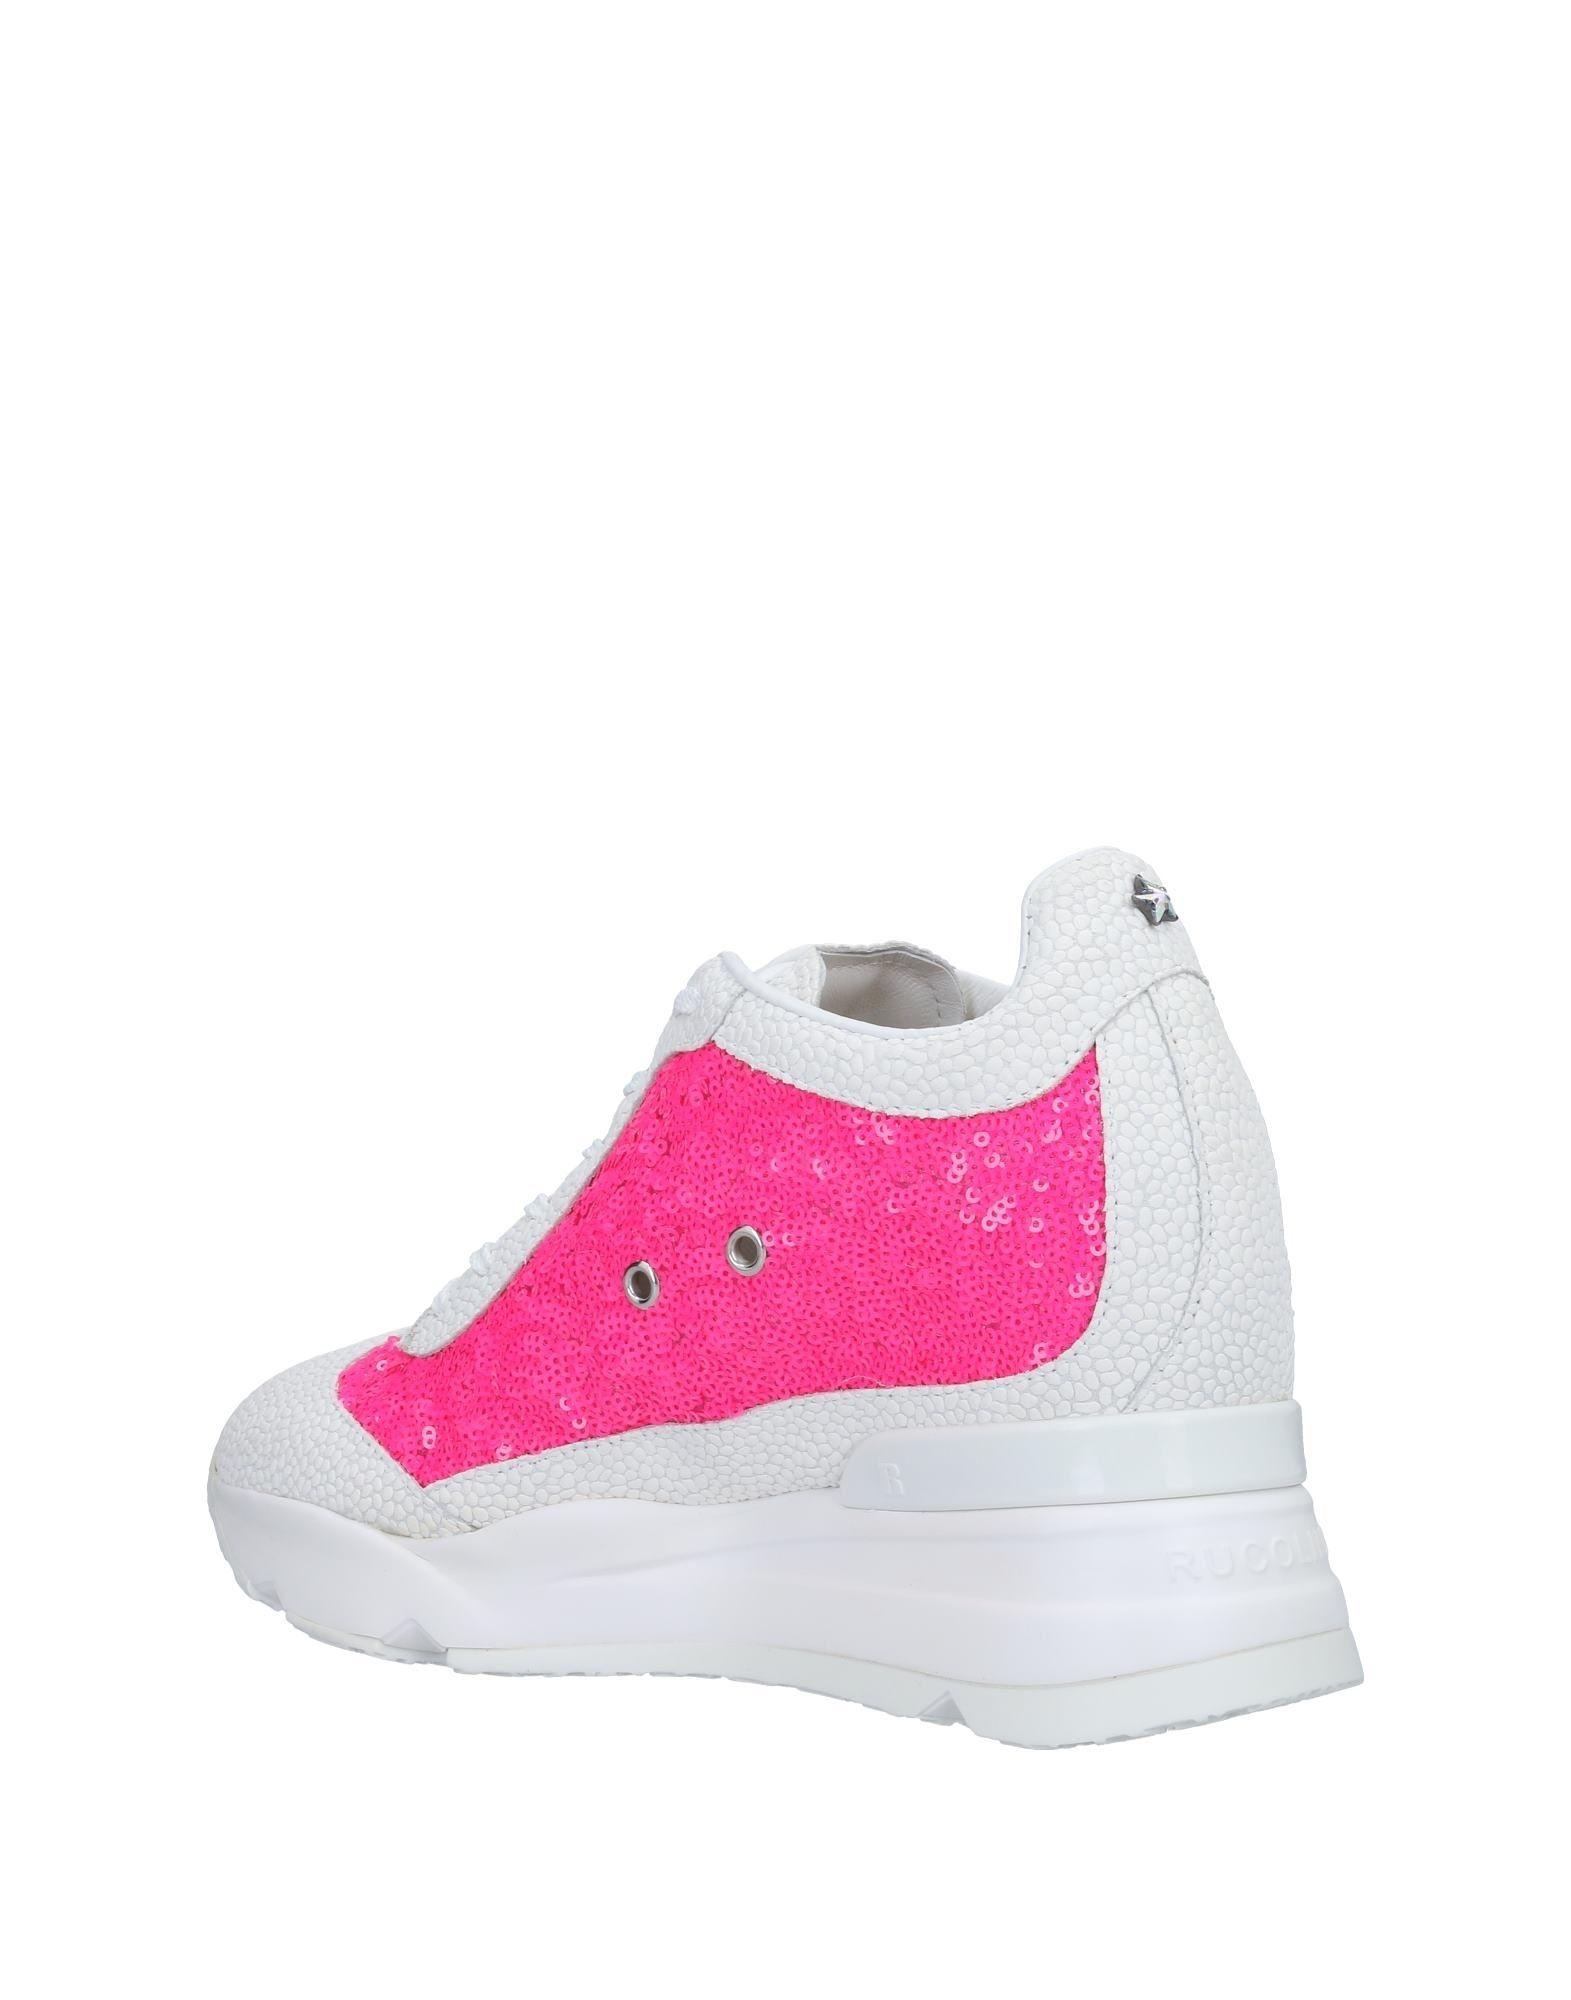 Stilvolle Sneakers billige Schuhe Ruco Line Sneakers Stilvolle Damen  11496763MI 3b9afc